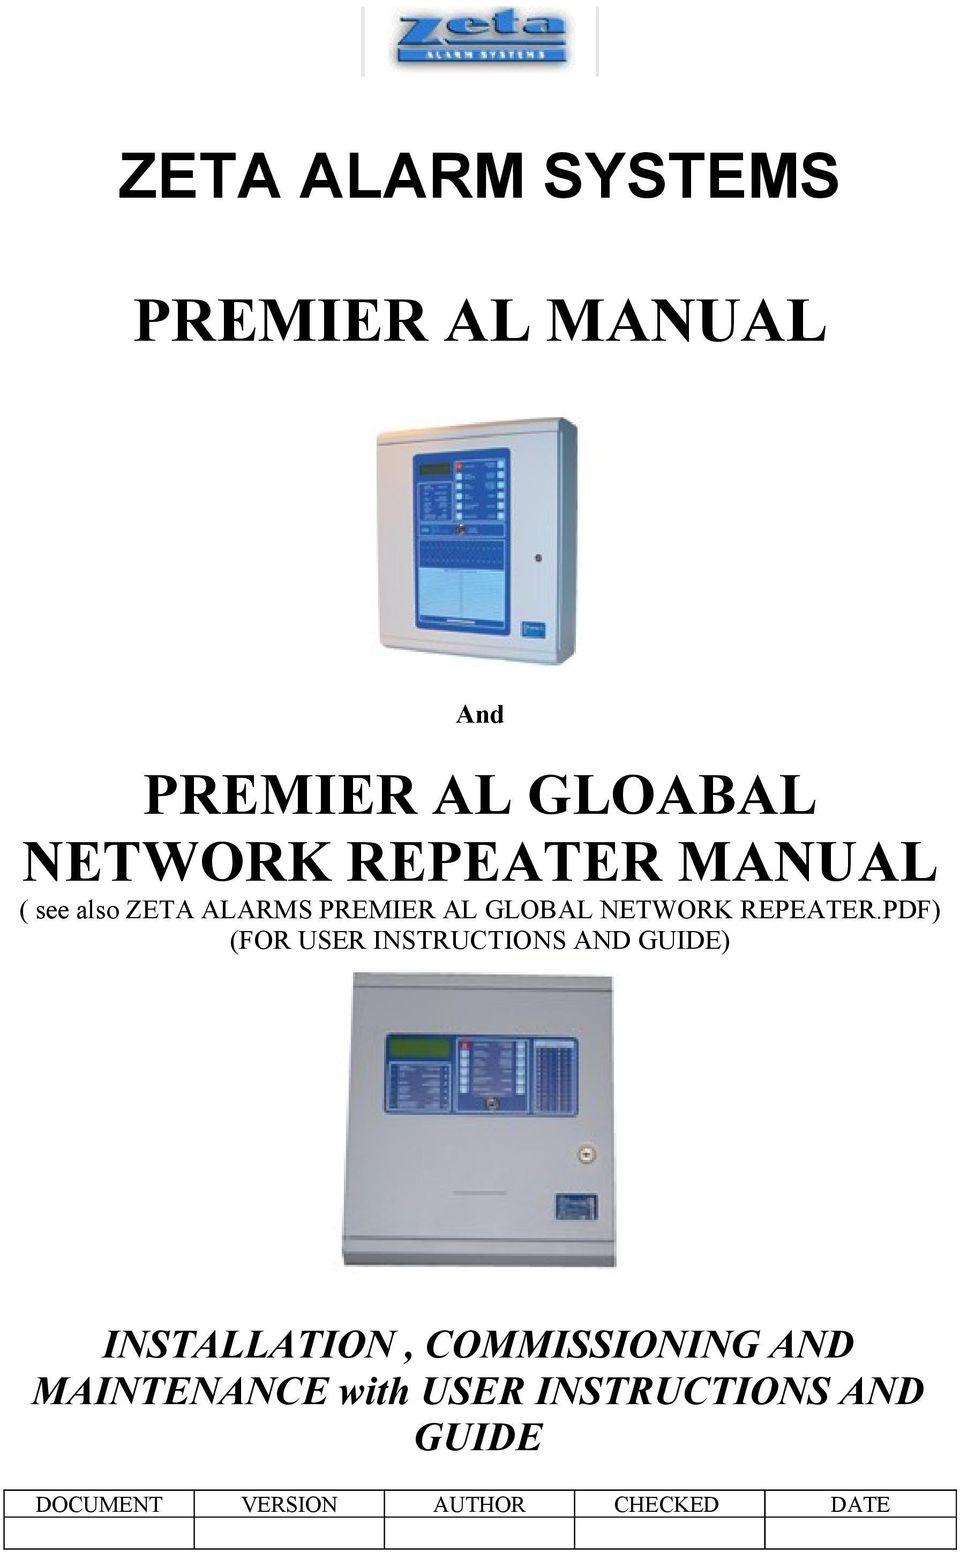 medium resolution of zeta addressable fire alarm system wiring diagram zeta alarm systems premier al manual pdfrh